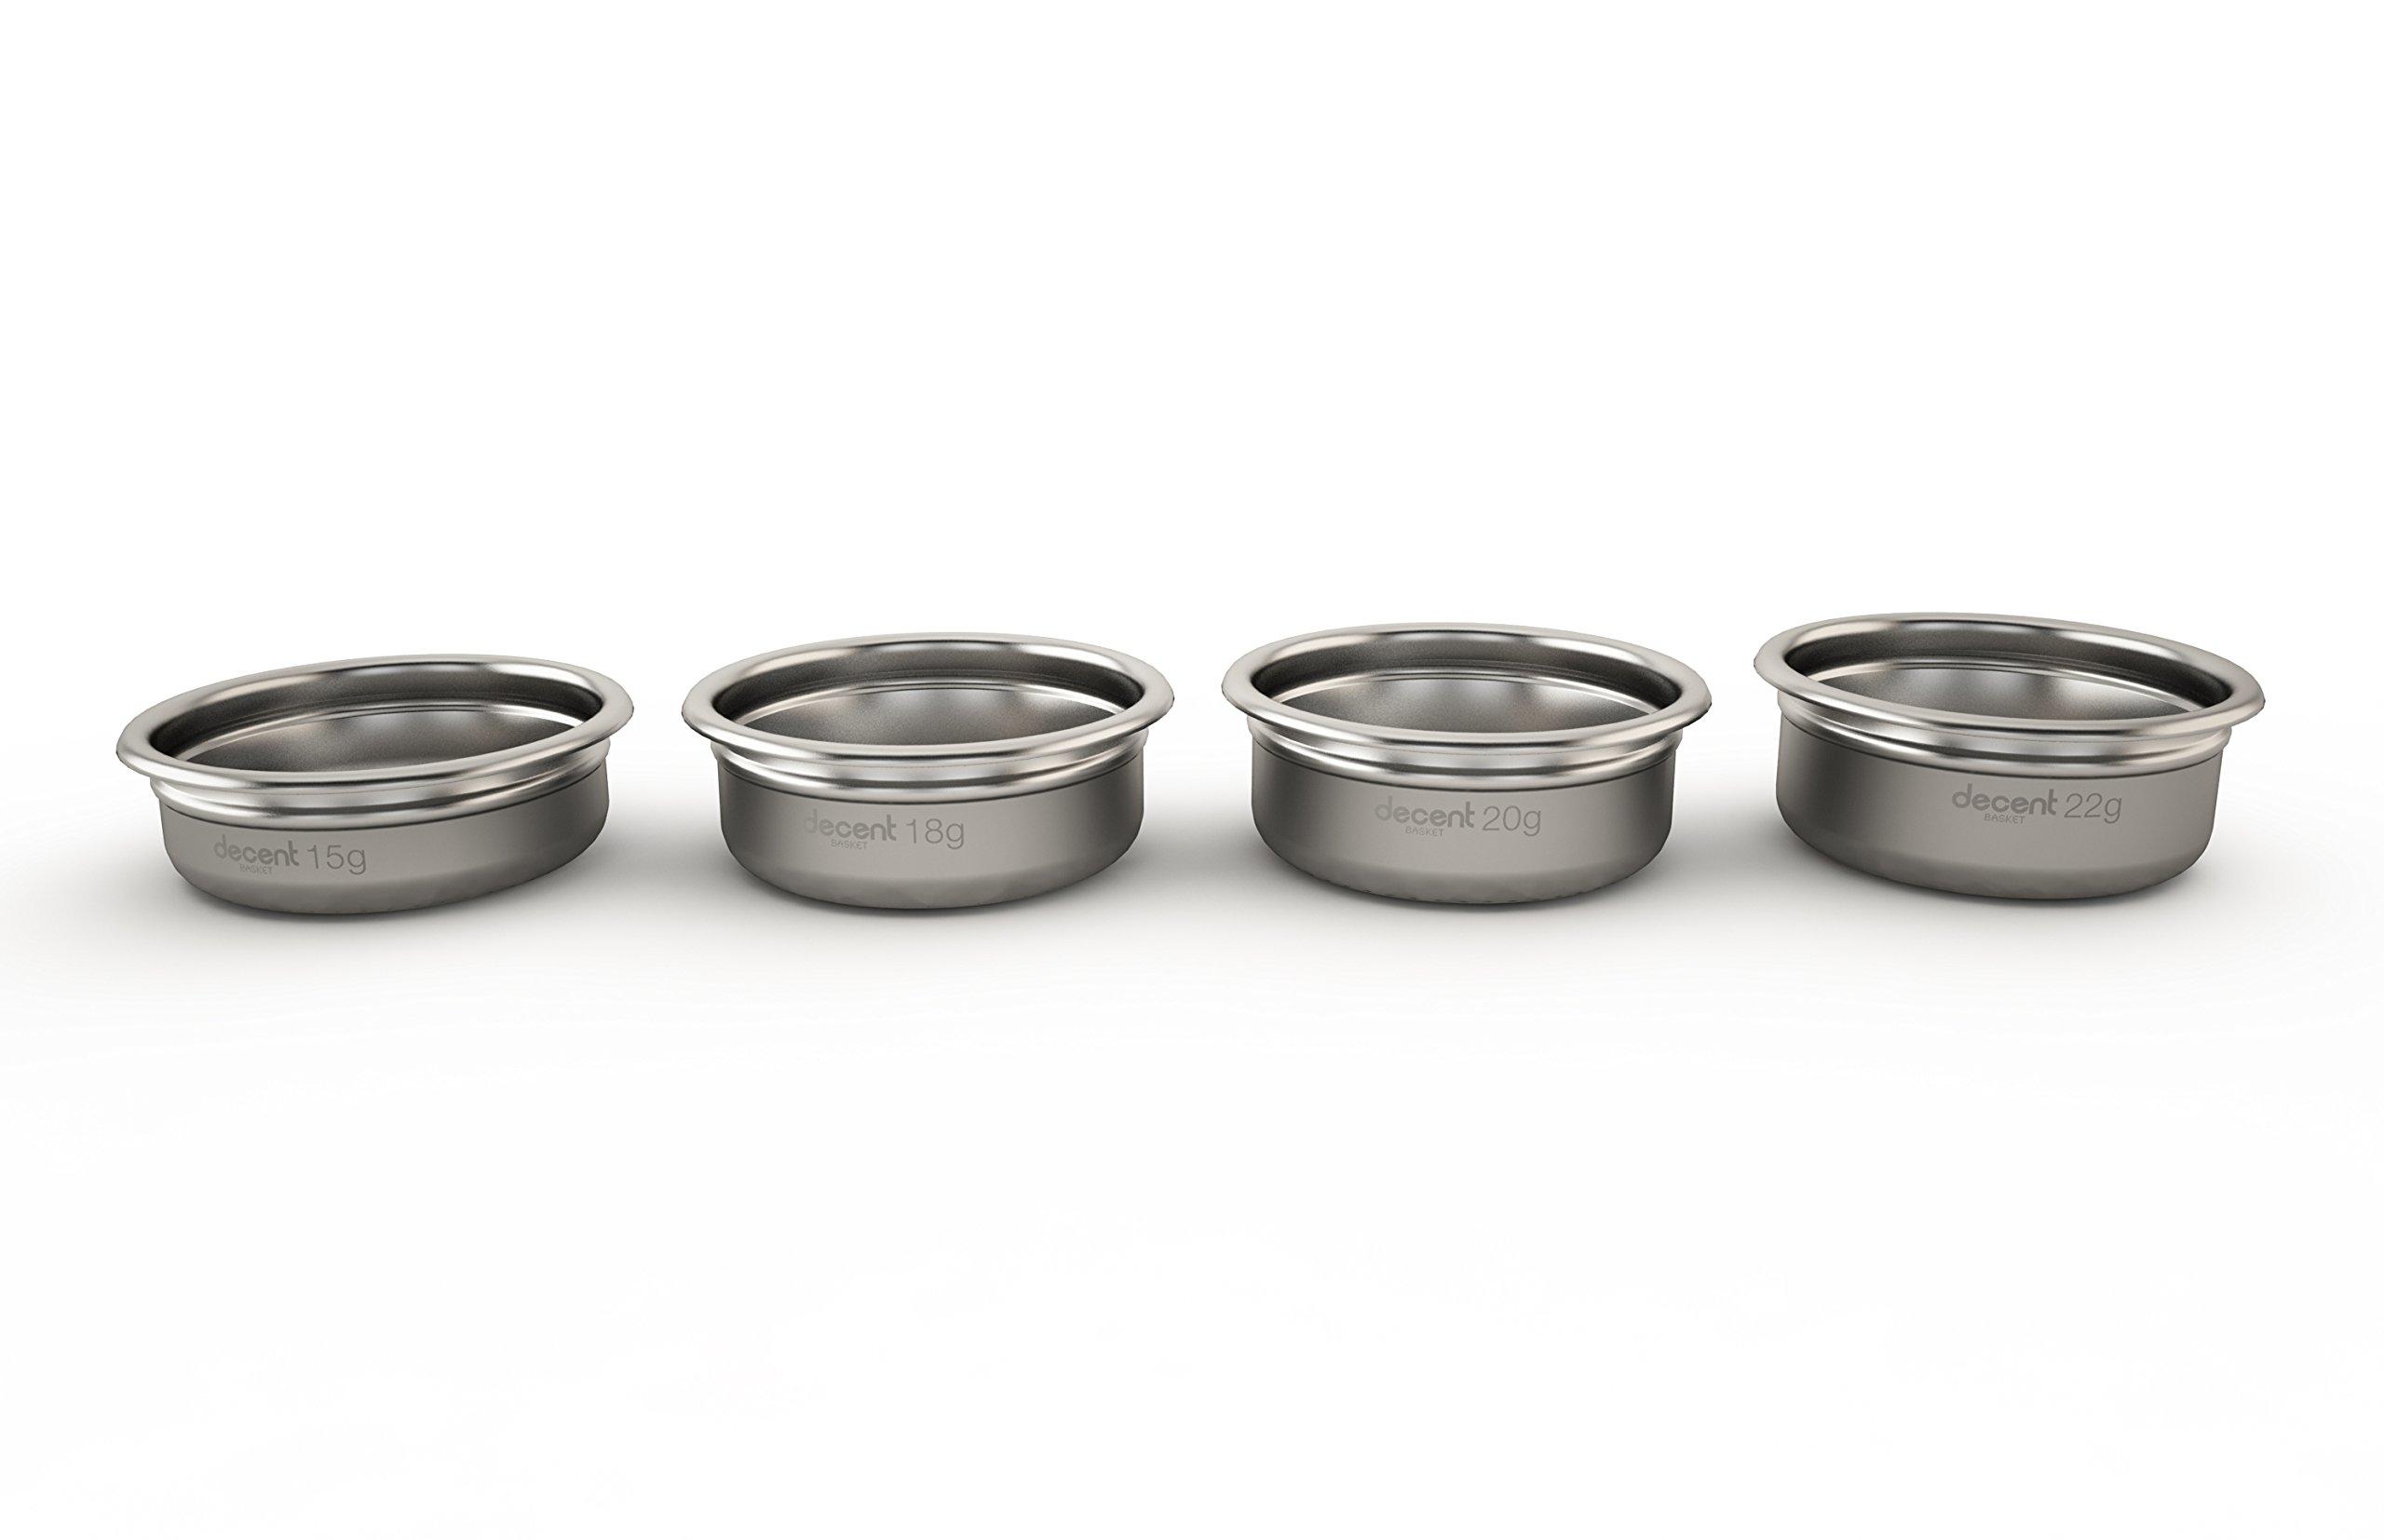 Portafilter Basket E61 58mm (4 most popular sizes: 15g, 18g, 20g, 22g)